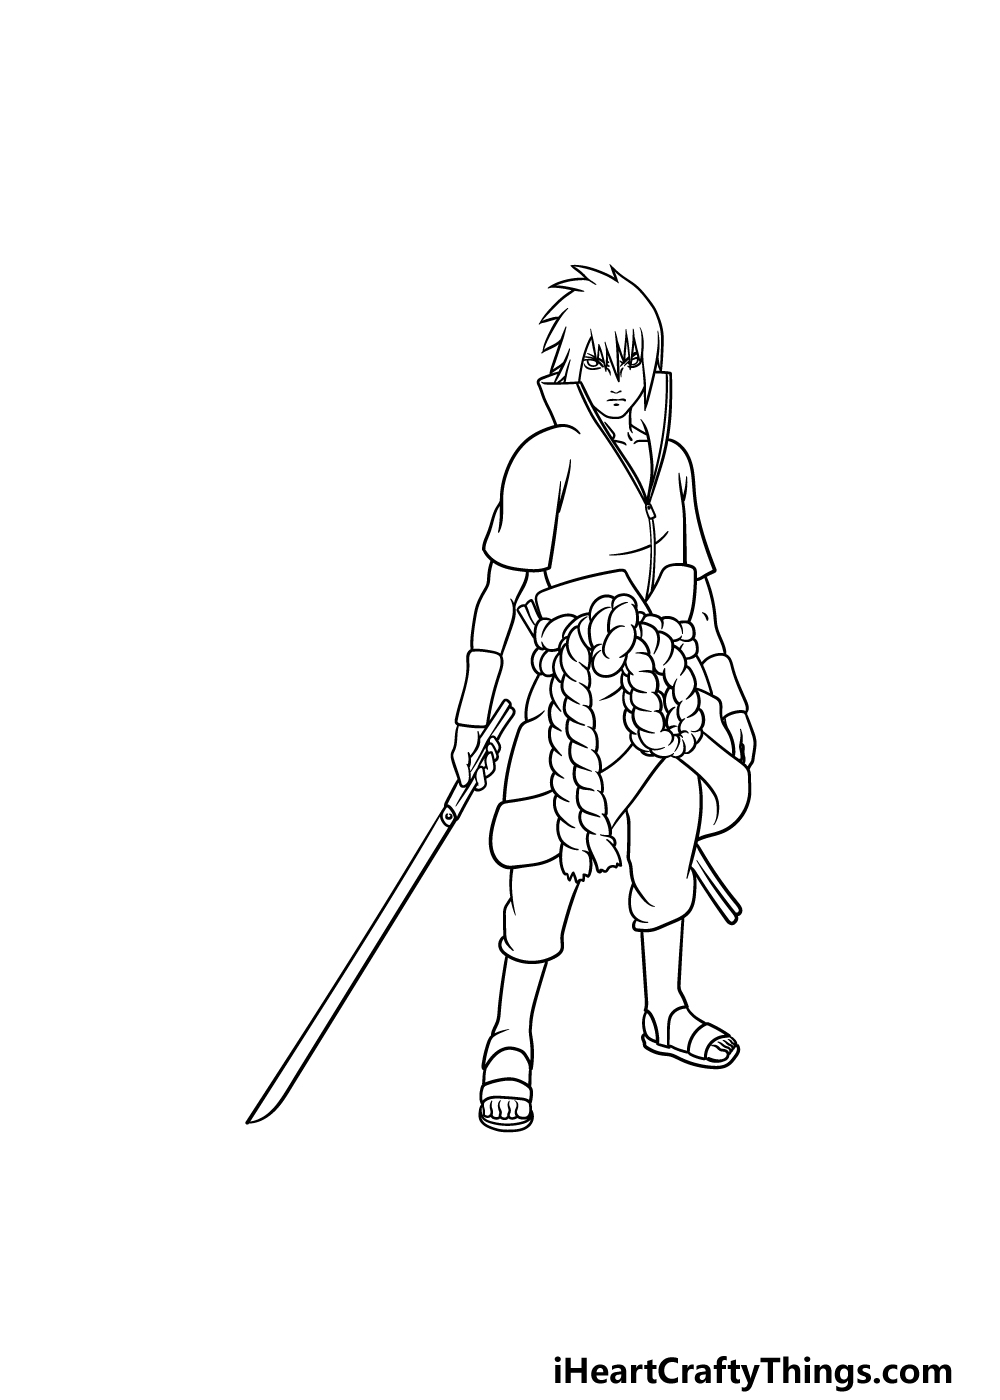 drawing Sasuke step 6